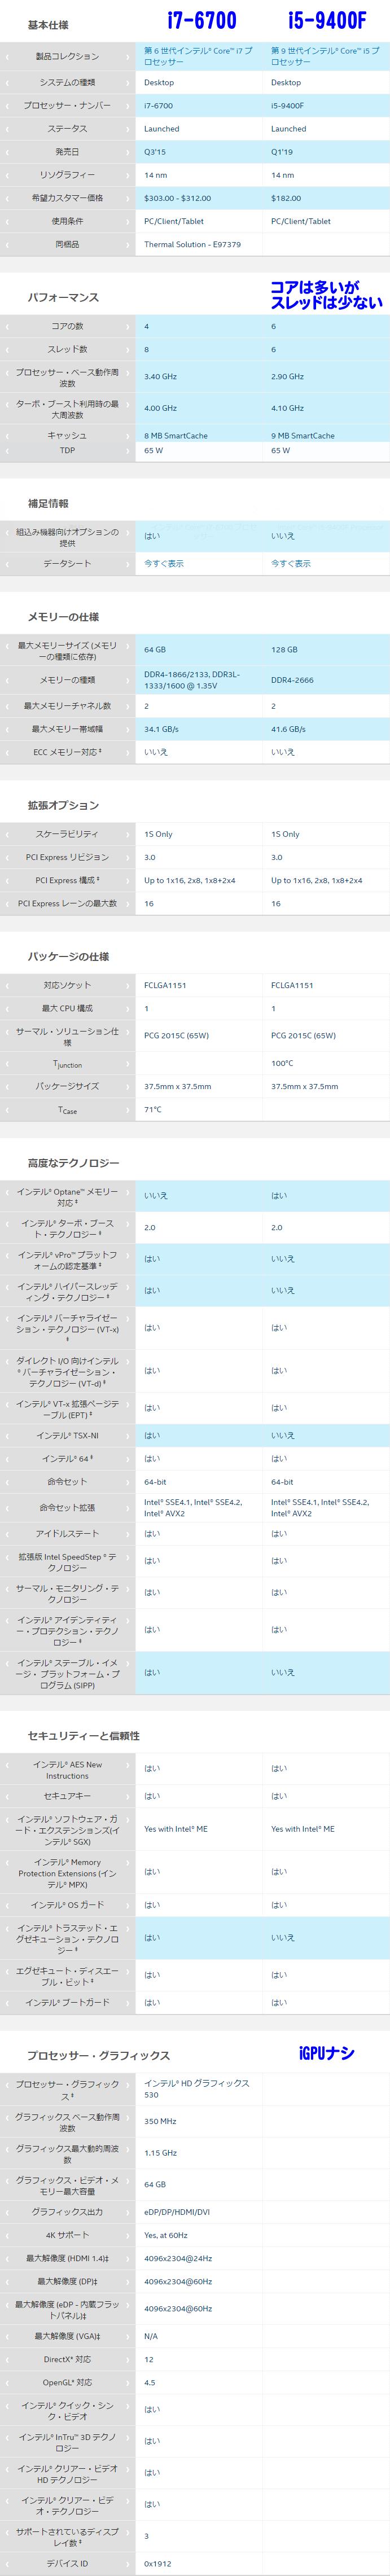 Core i7-6700_vs_Core i5-9400F